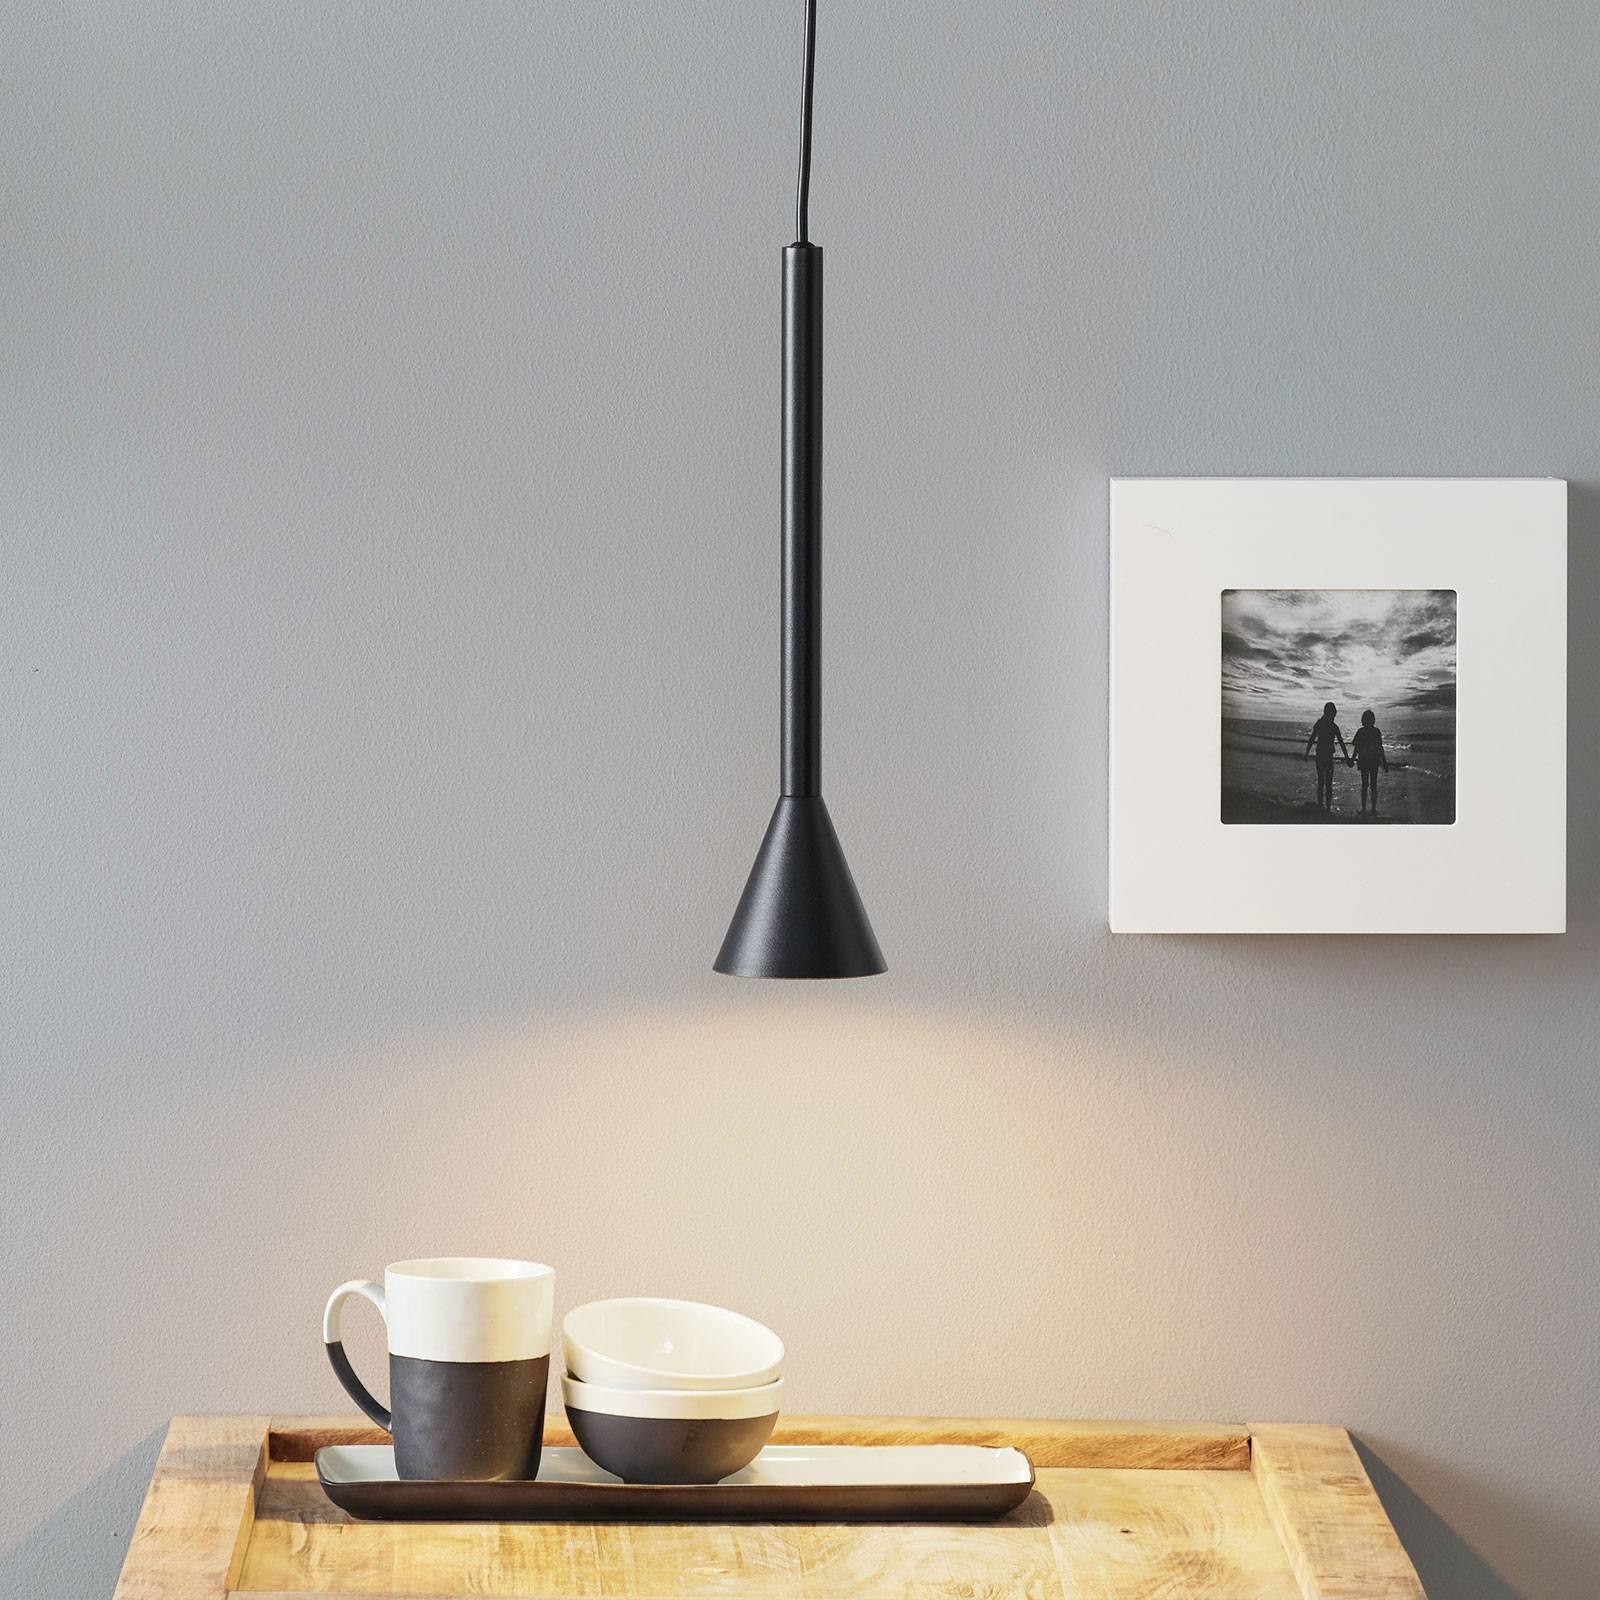 Lucande Caris -riippuvalo Ø 8,5 cm musta/kulta